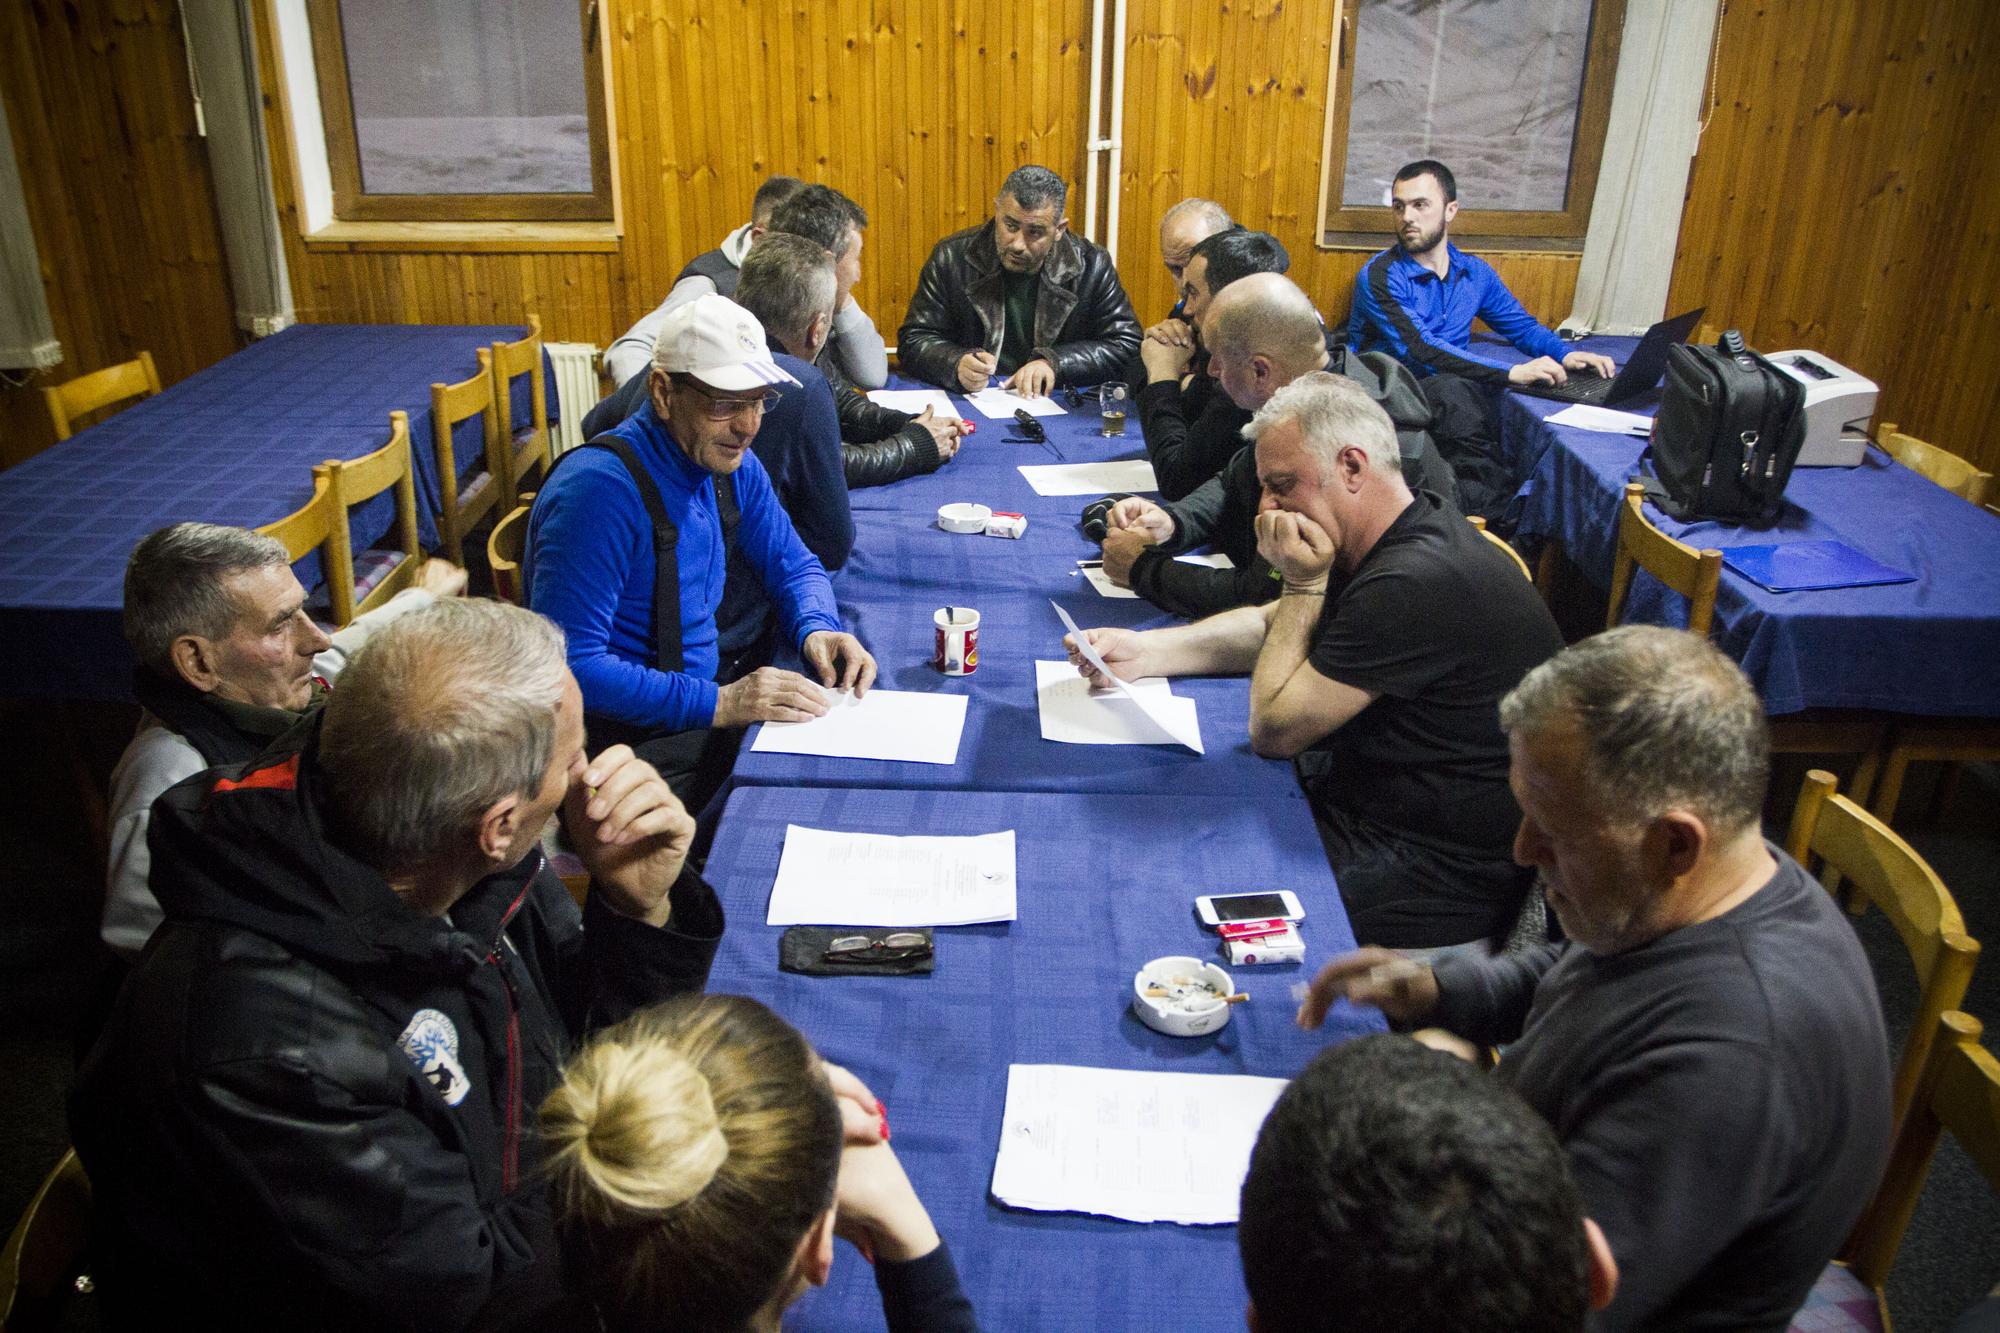 Fisnik DOBRECI Fed Gara Sllallom 092